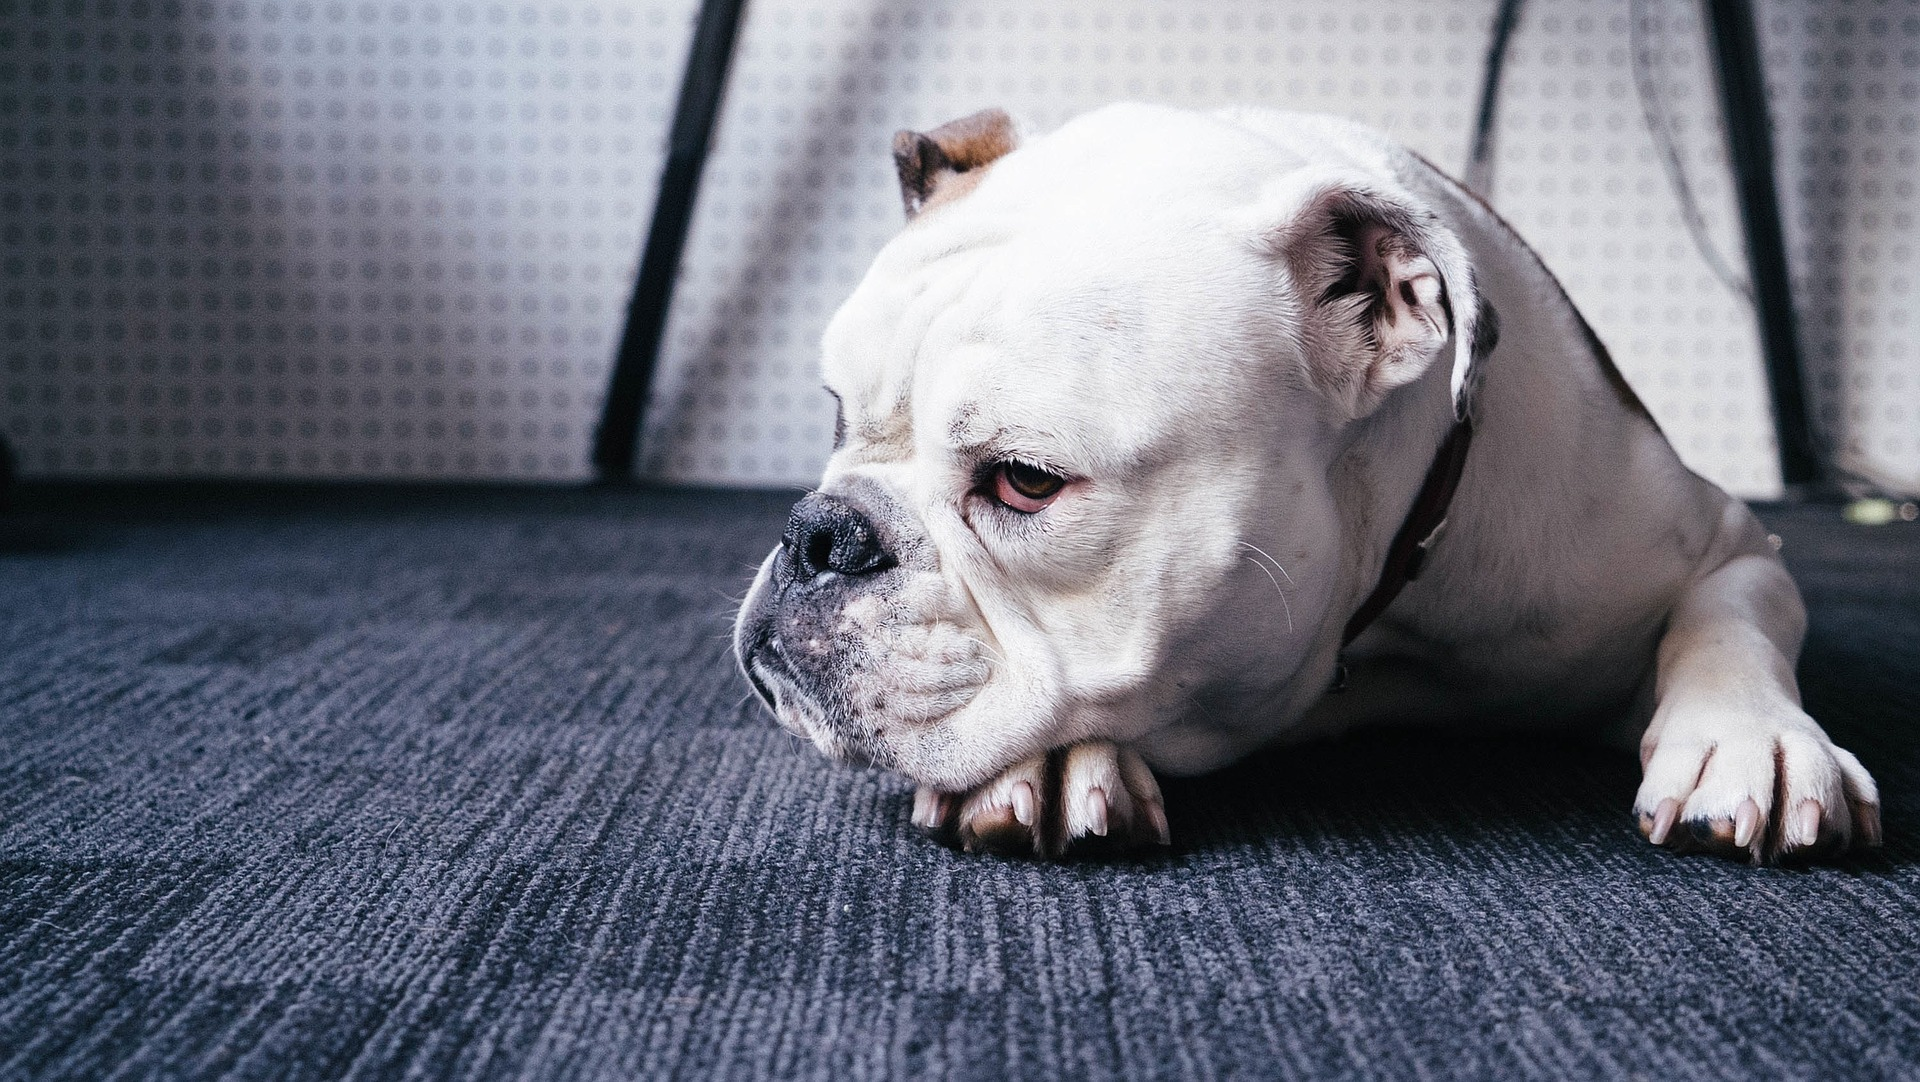 download wallpaper: bulldog wallpaper